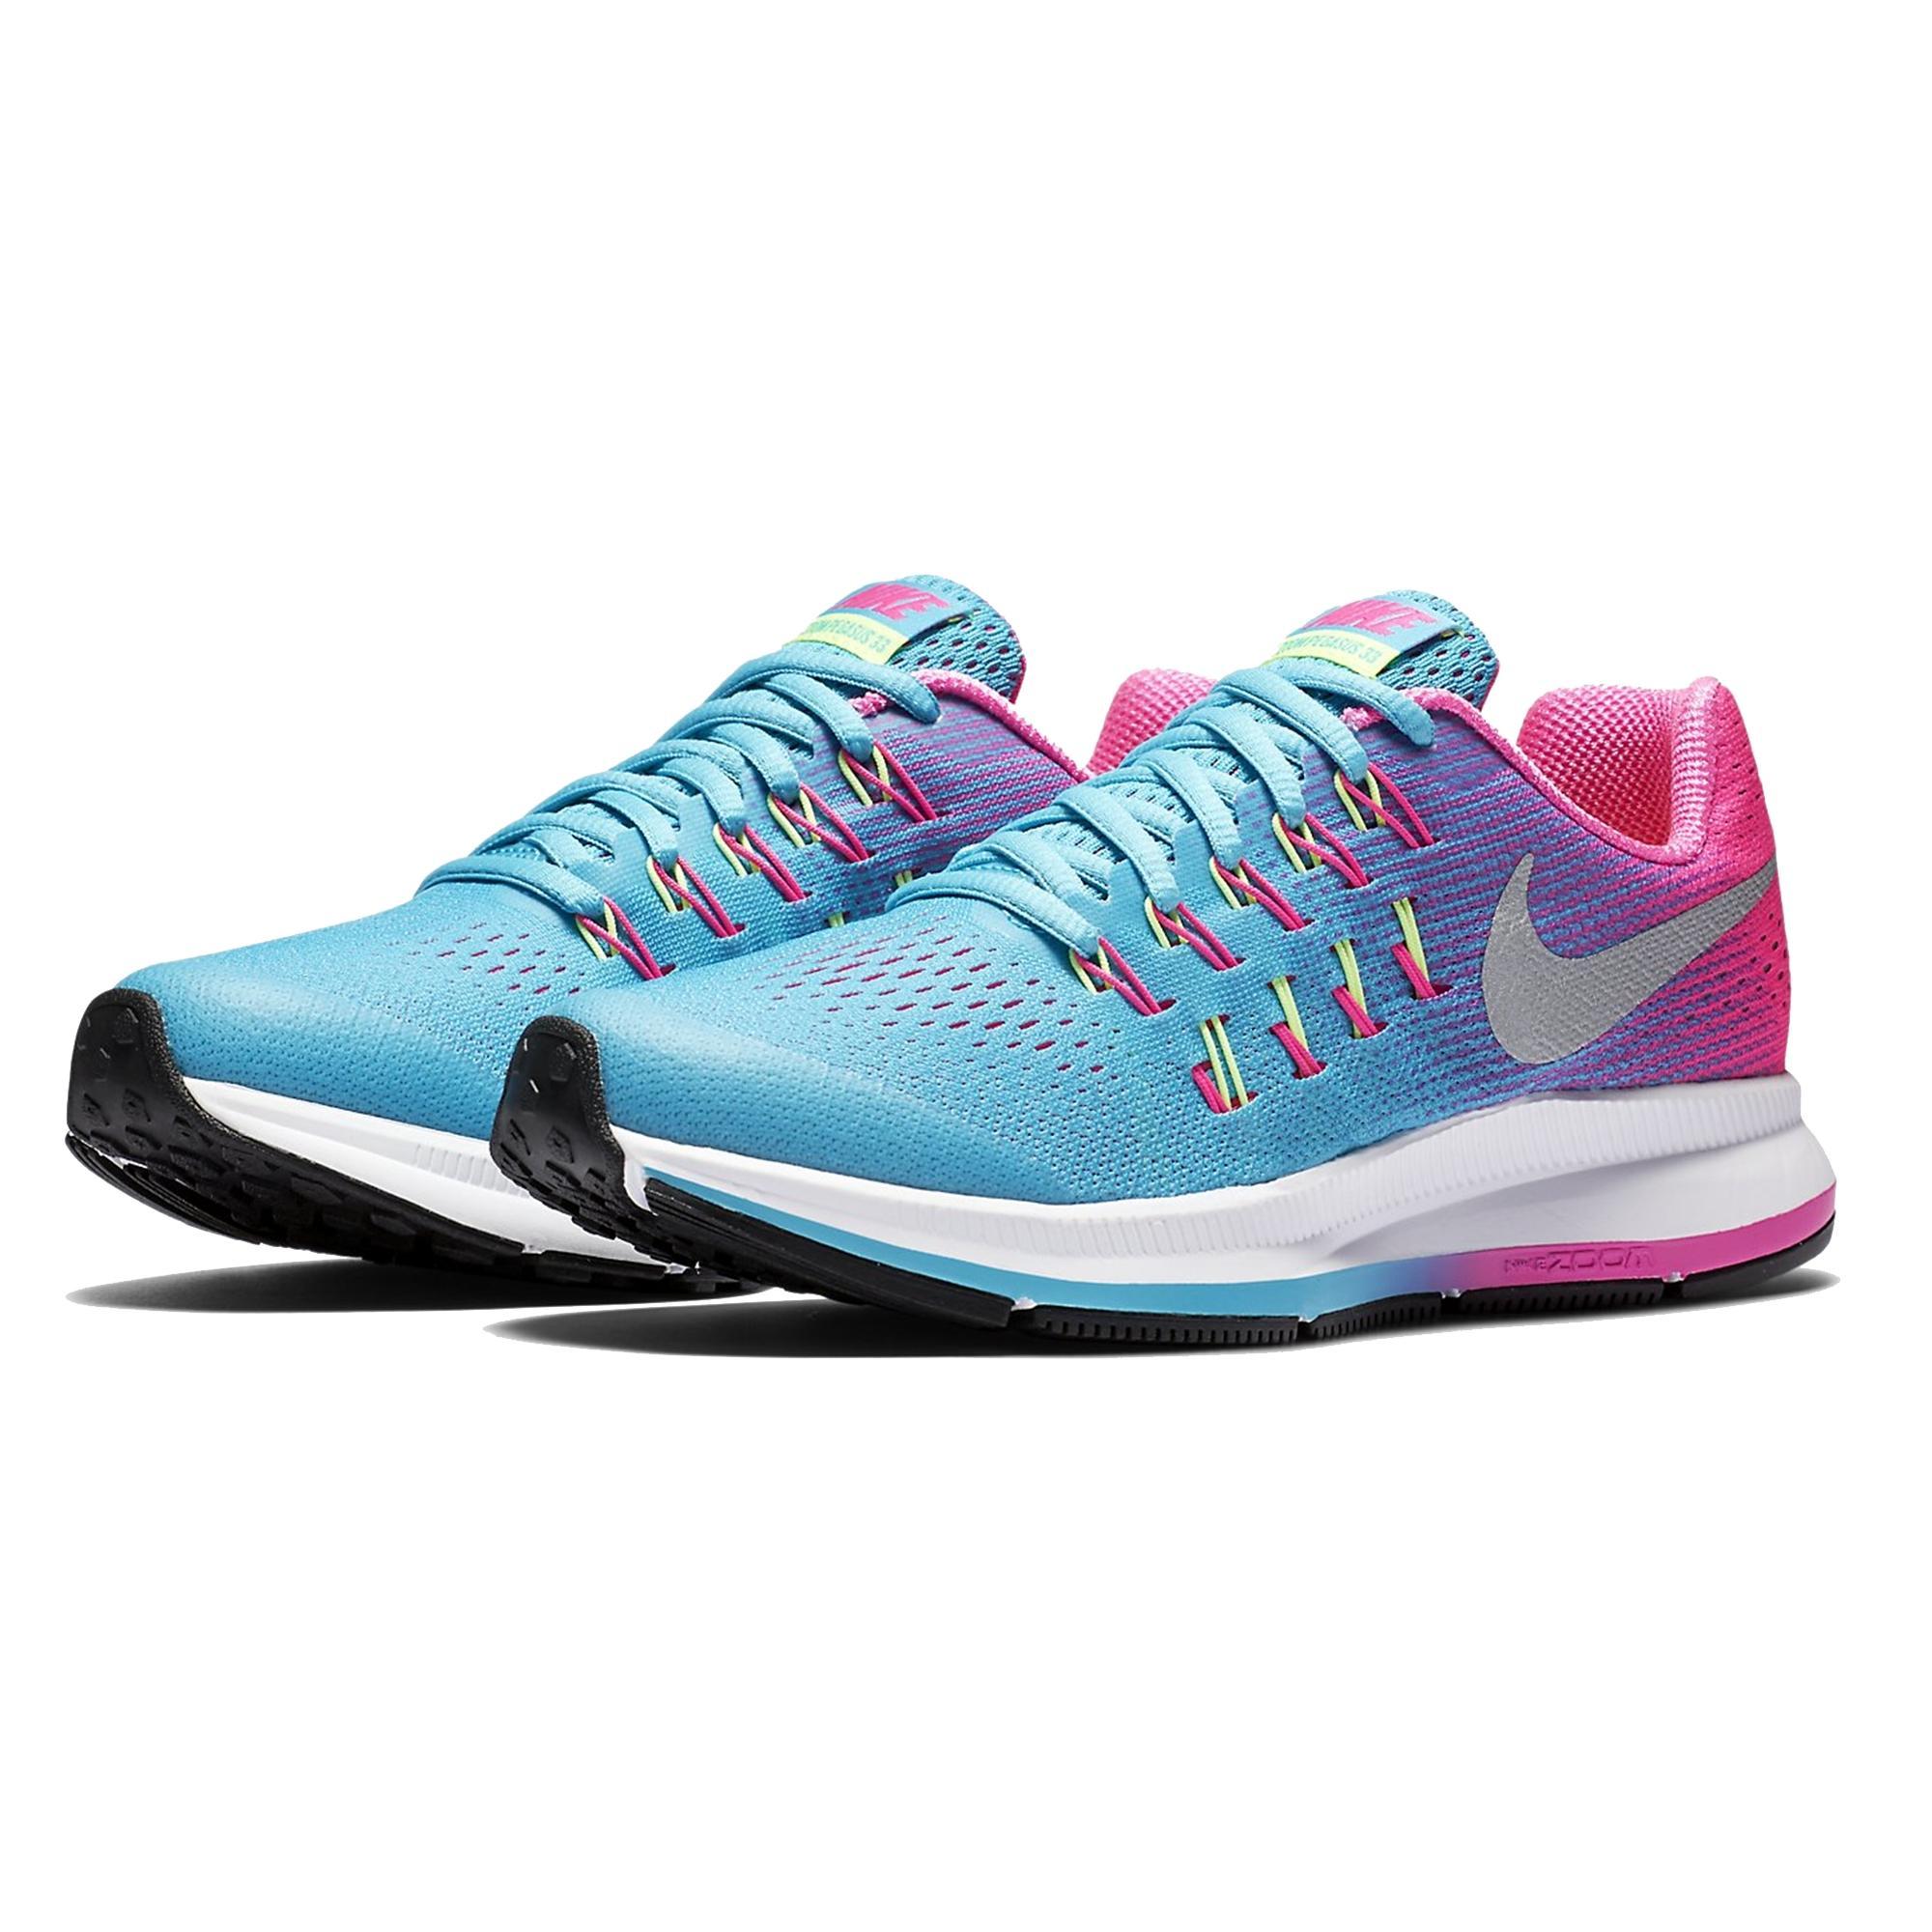 6c58d3a2a5 Nike Zoom Pegasus 33 (Gs) Spor Ayakkabı #834317-400 - Barcin.com